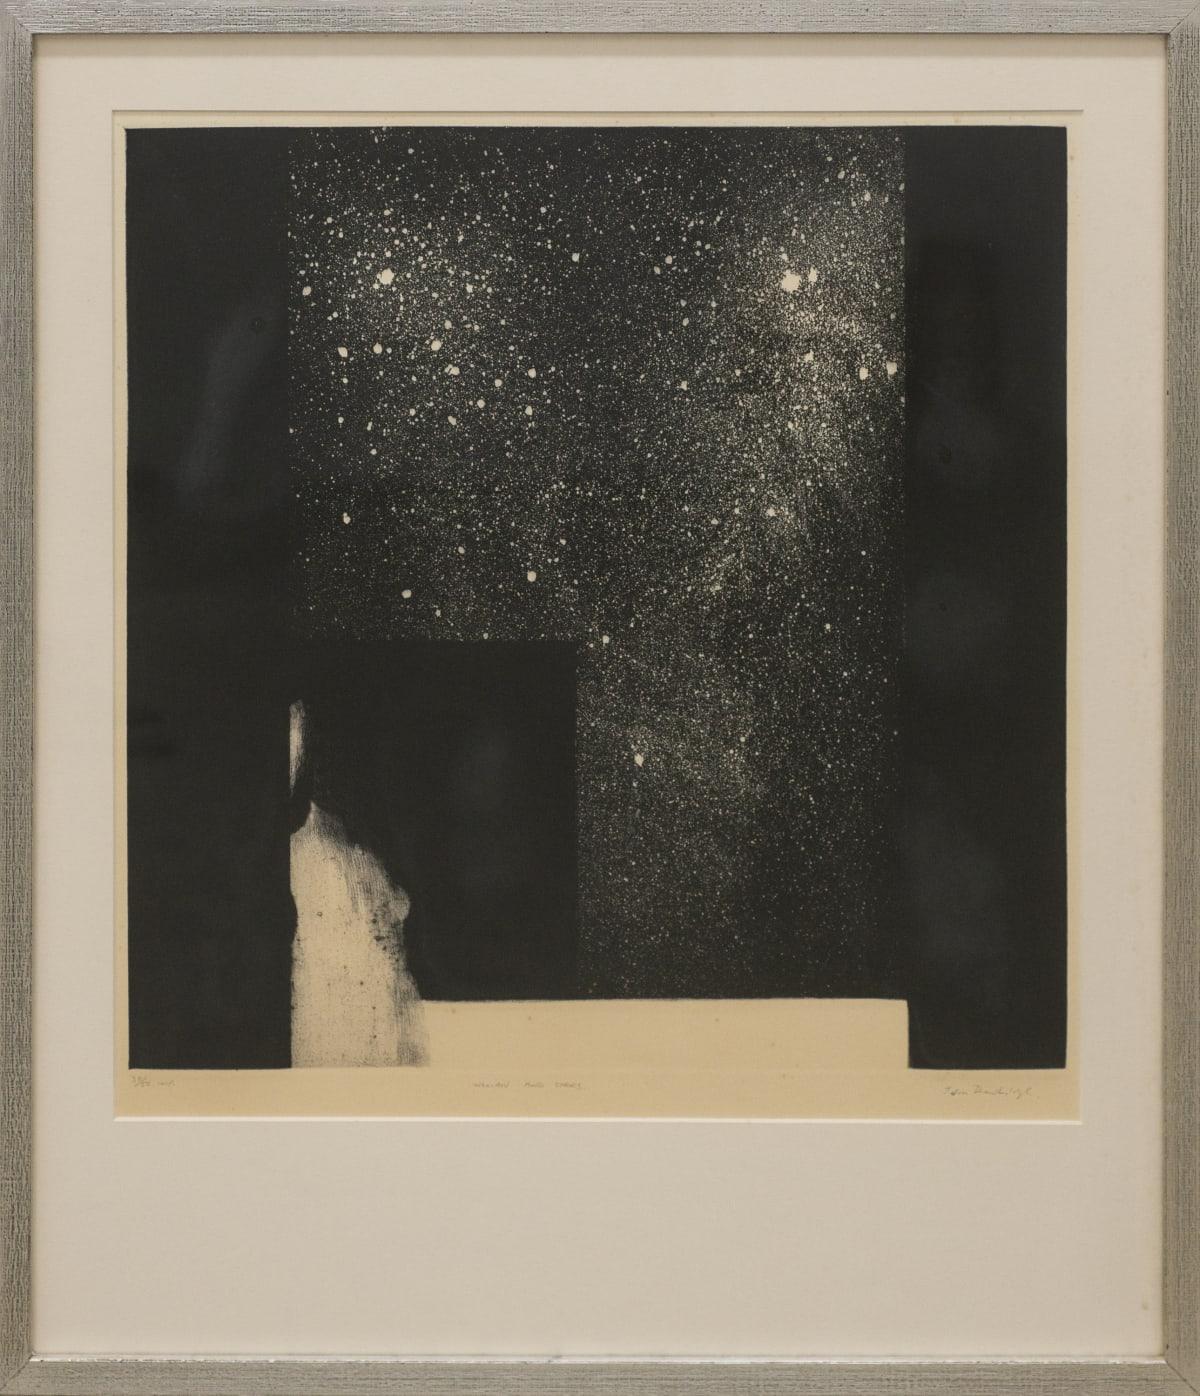 John Drawbridge, Woman and Stars, 30/50 (Framed), n.d.